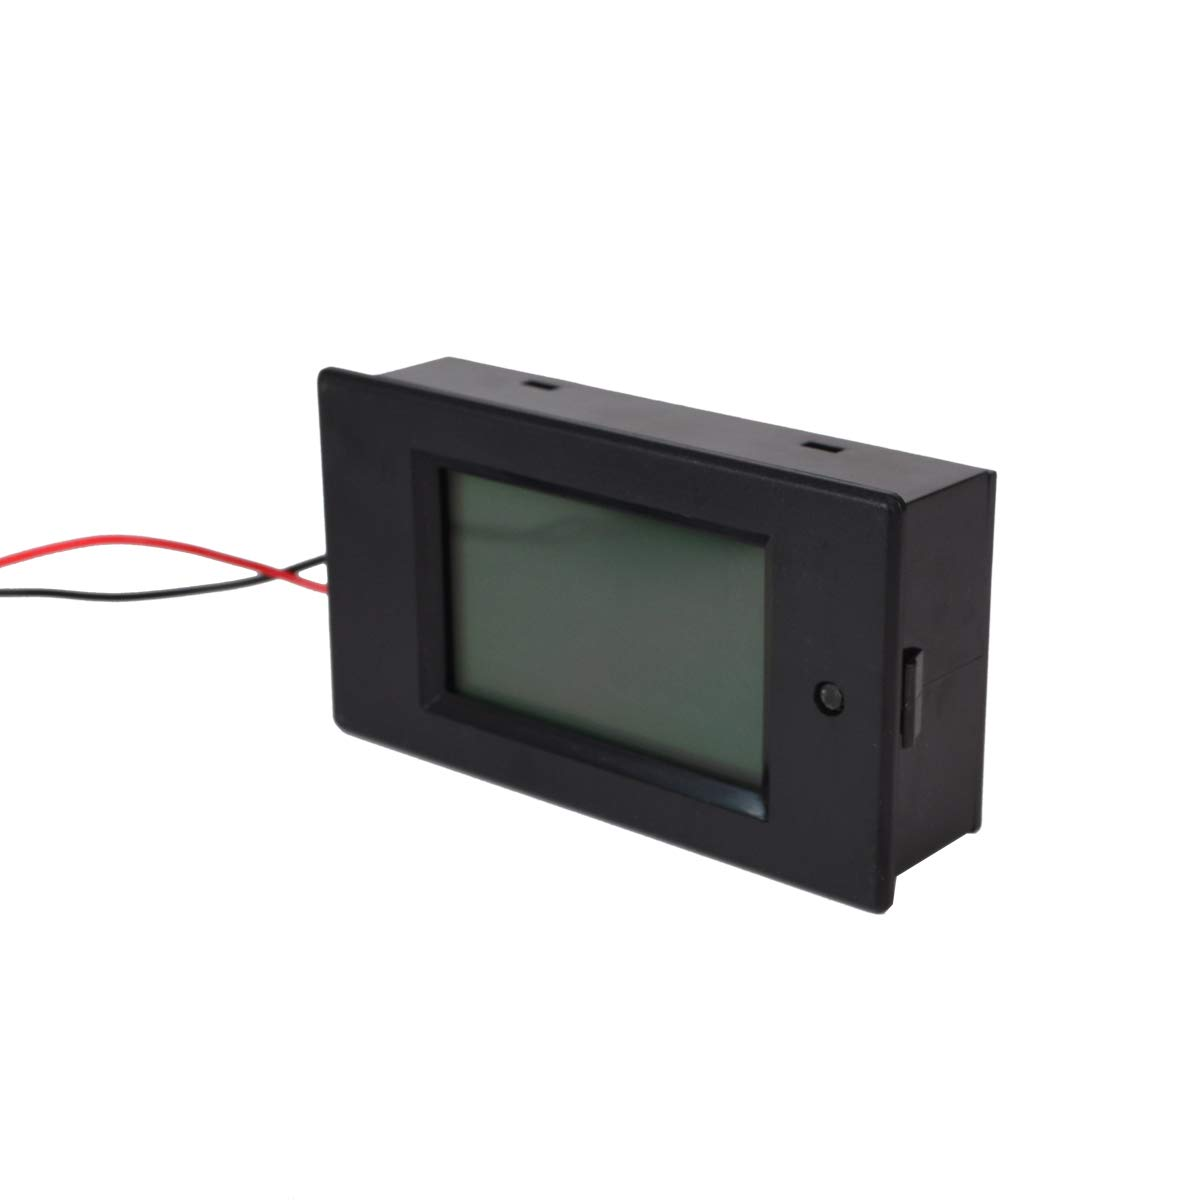 Baitaihem AC 80-260V 100A LCD Display Digital Current Voltage Power Energy Meter Multimeter Ammeter Voltmeter by Baitaihem (Image #3)